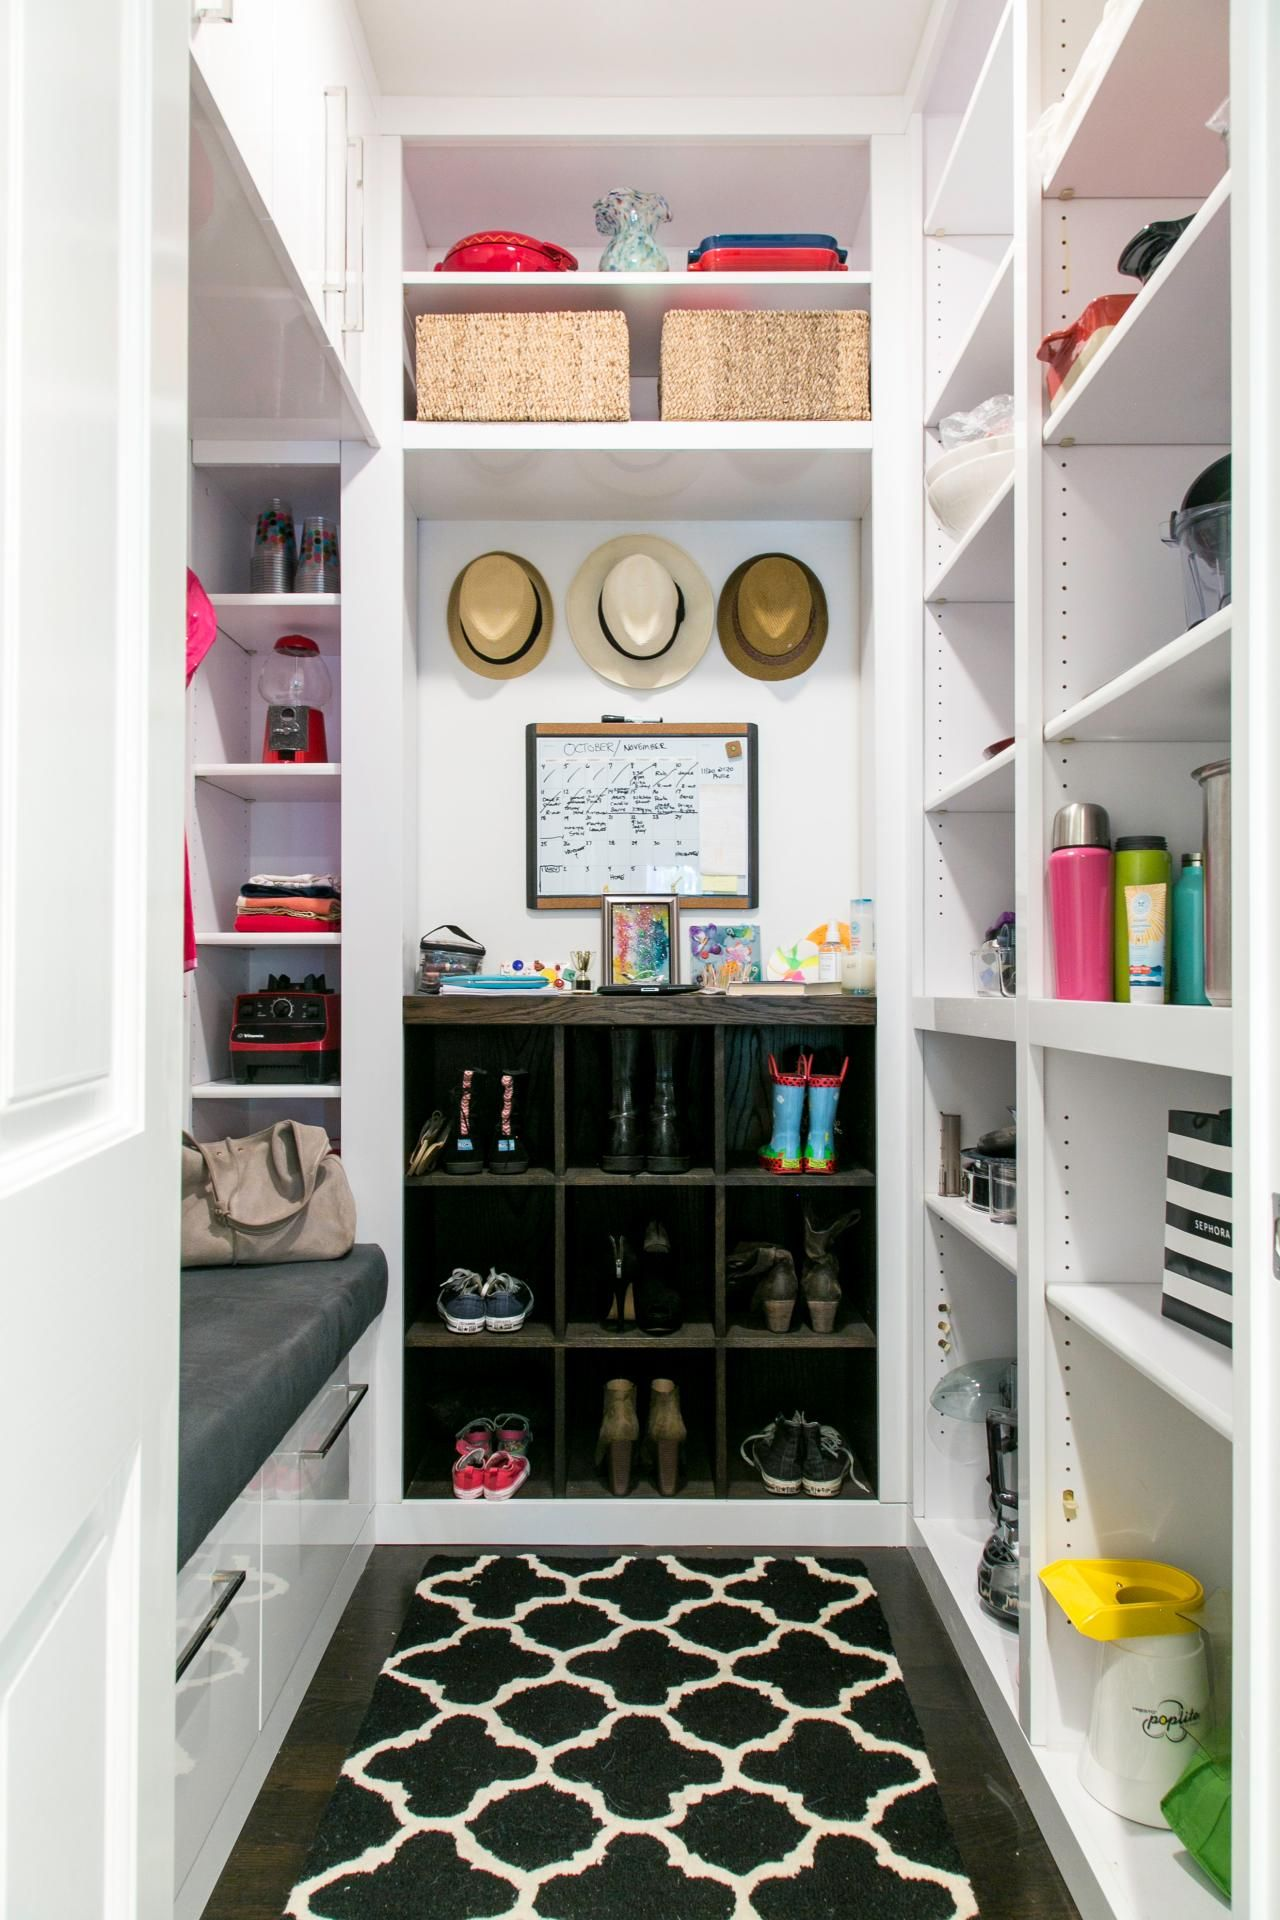 Peek Inside Actress Christina Applegates Gorgeous Kitchen Makeover With Design